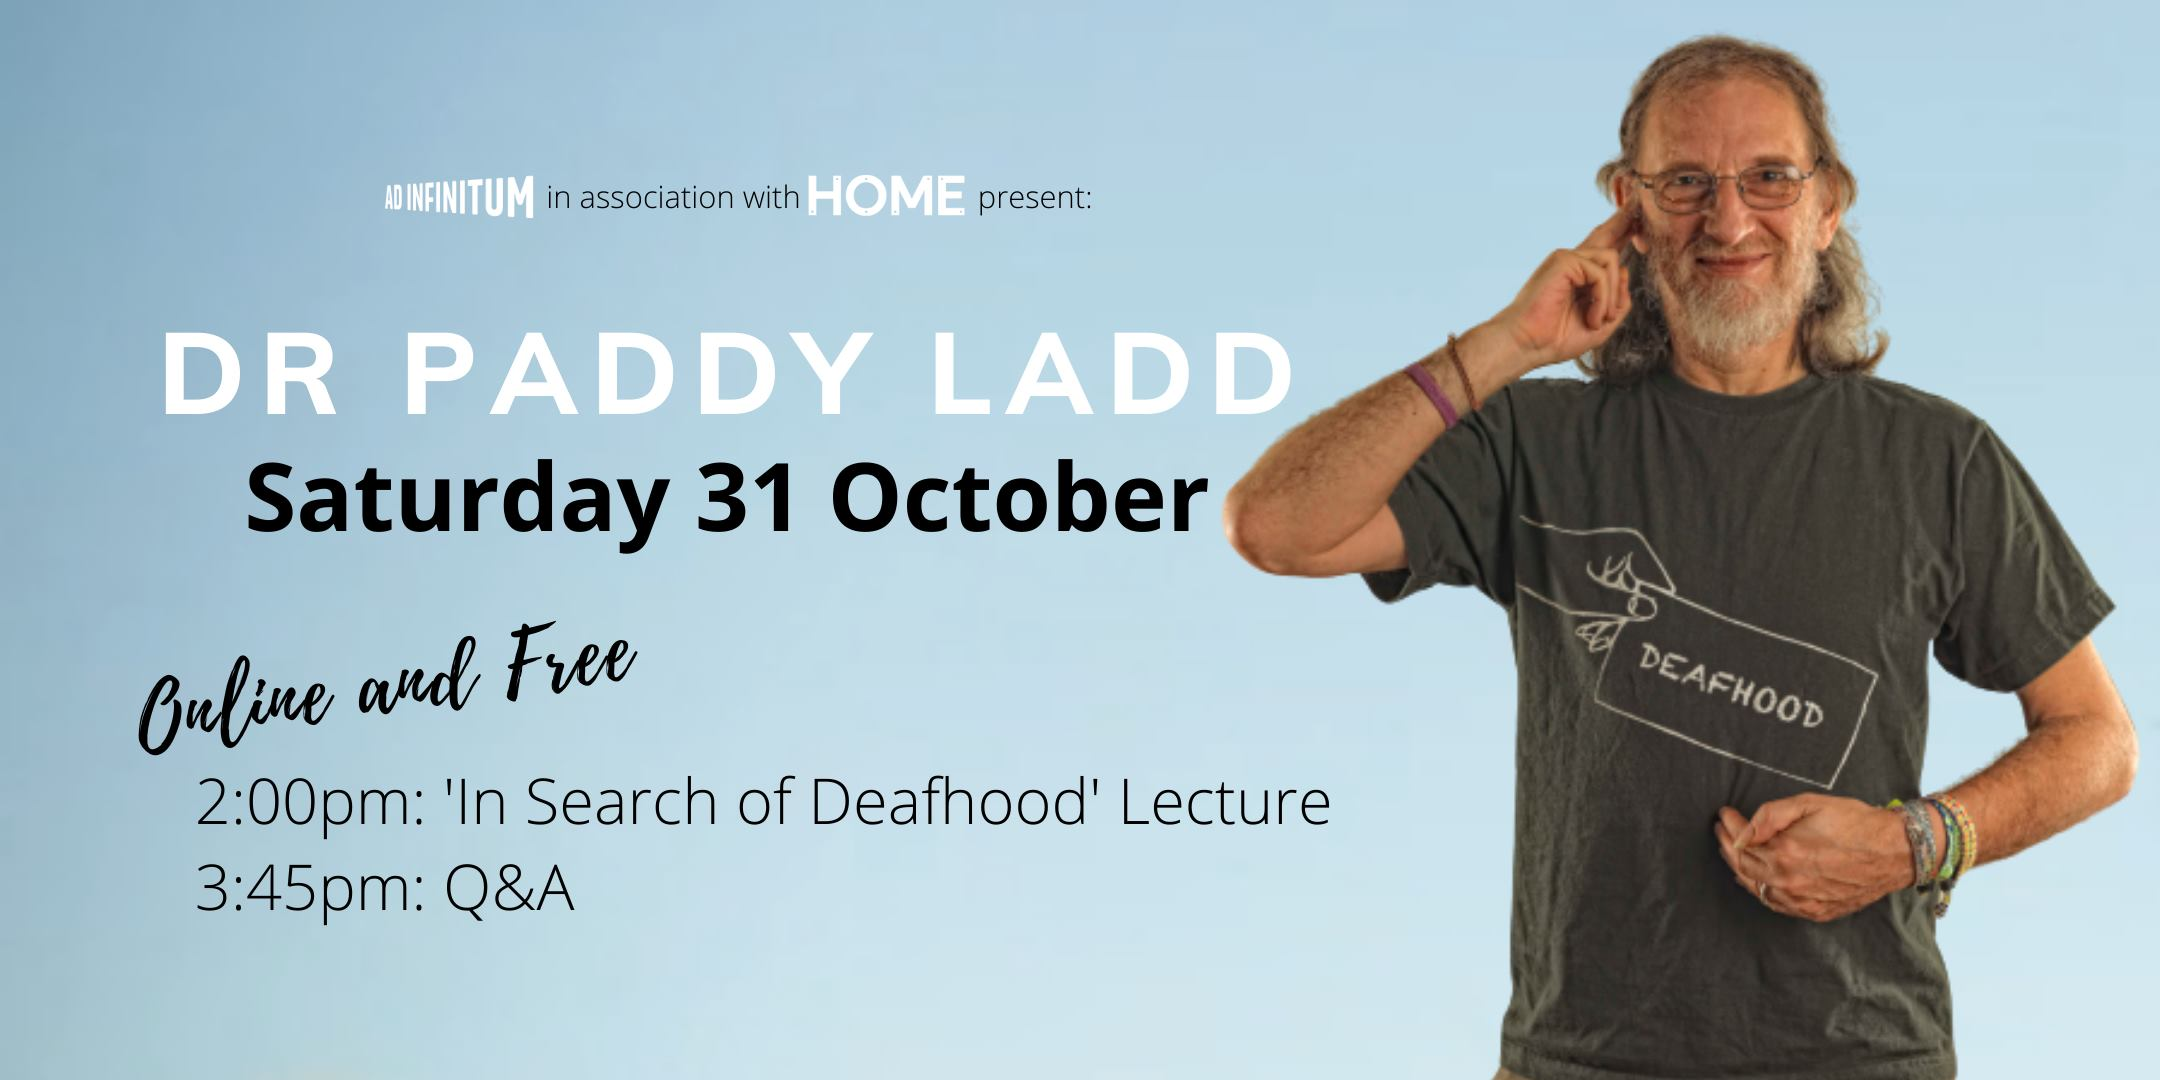 dr paddy ladd